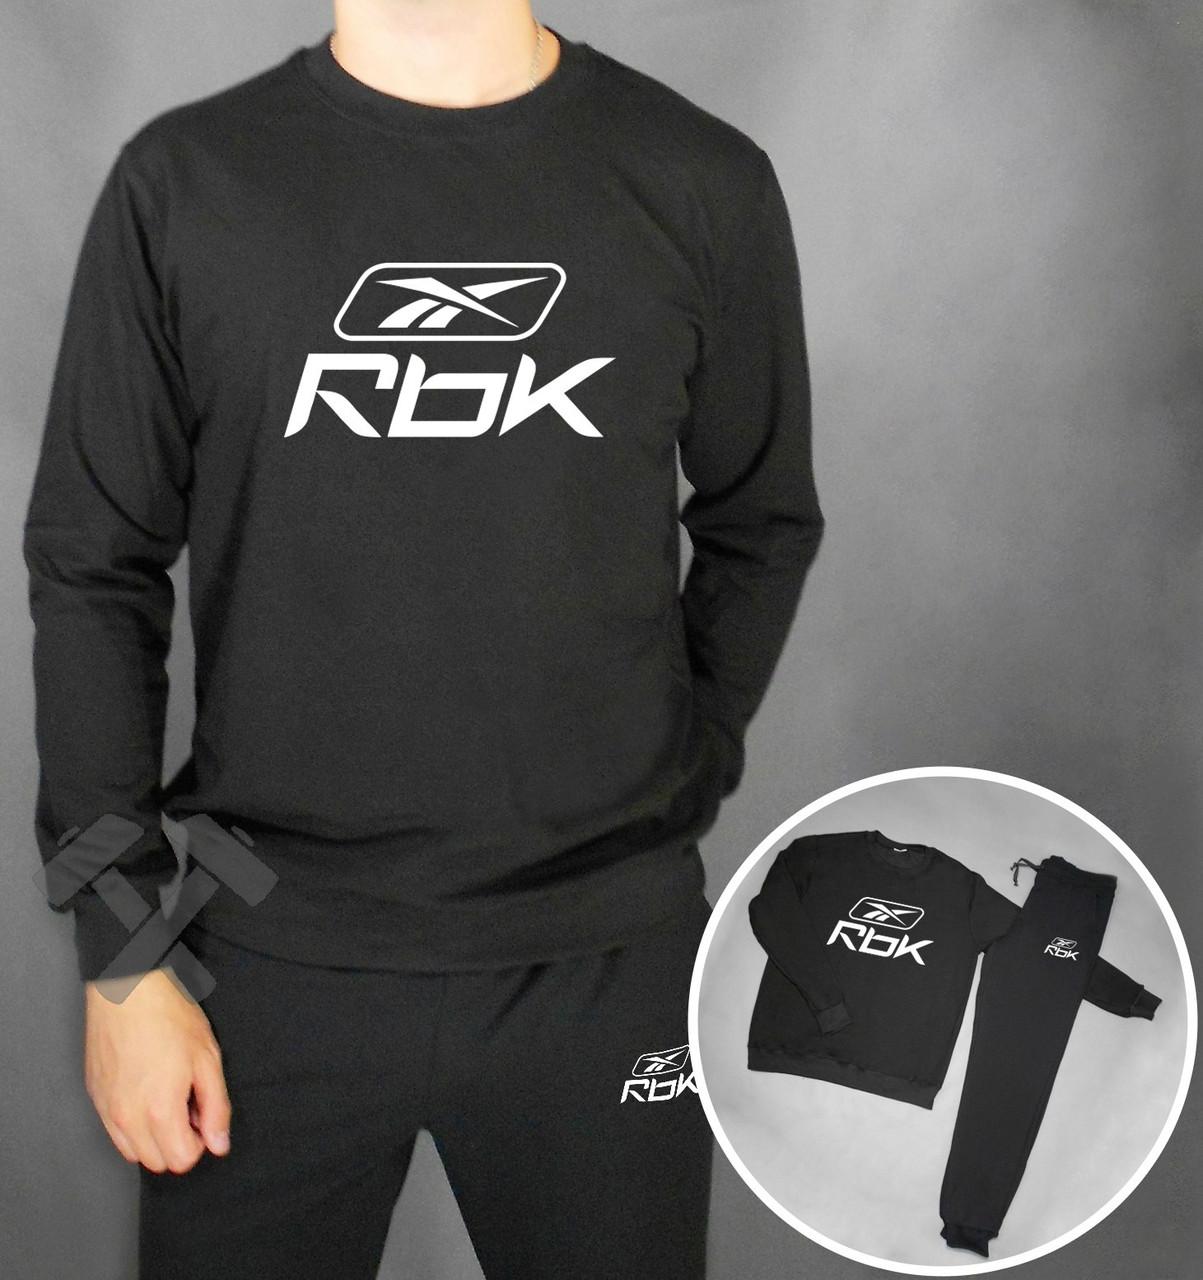 Спортивный костюм RBK черного цвета